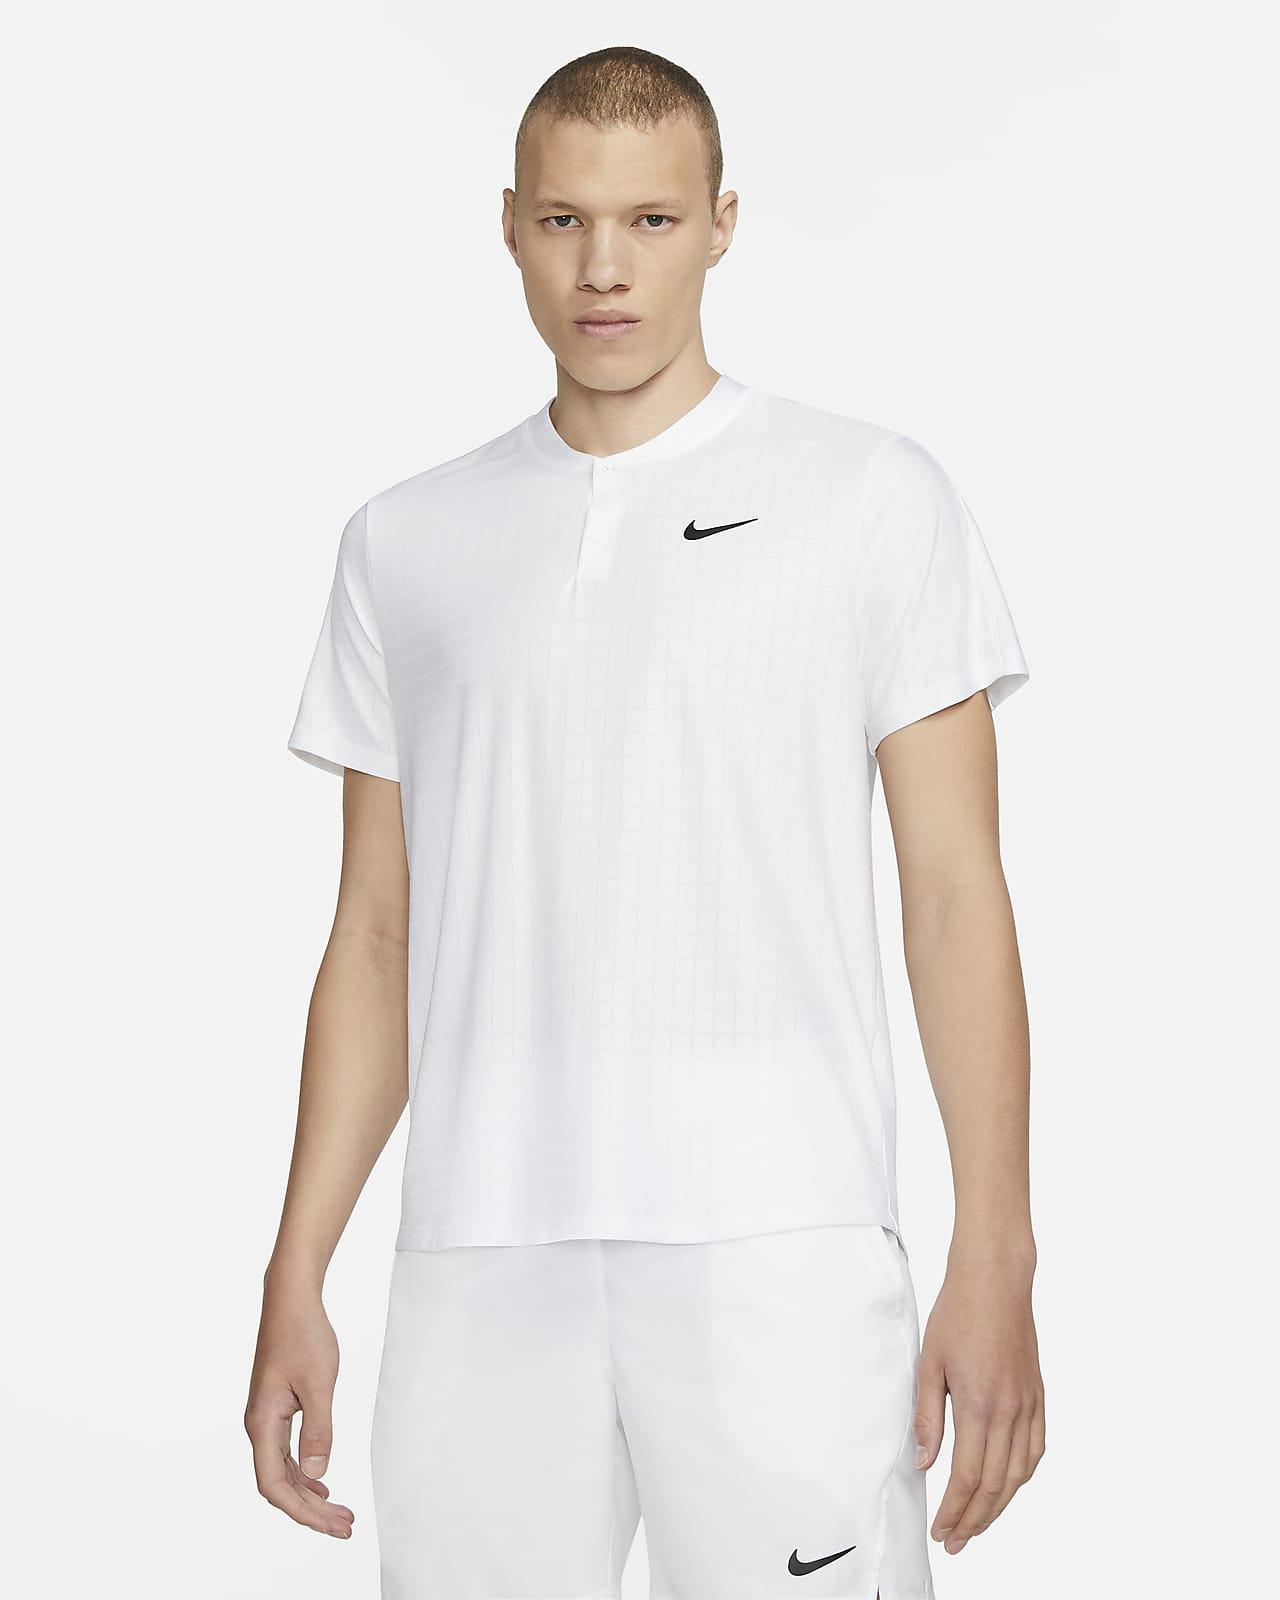 NikeCourt Dri-FIT Advantage tennisskjorte for herre